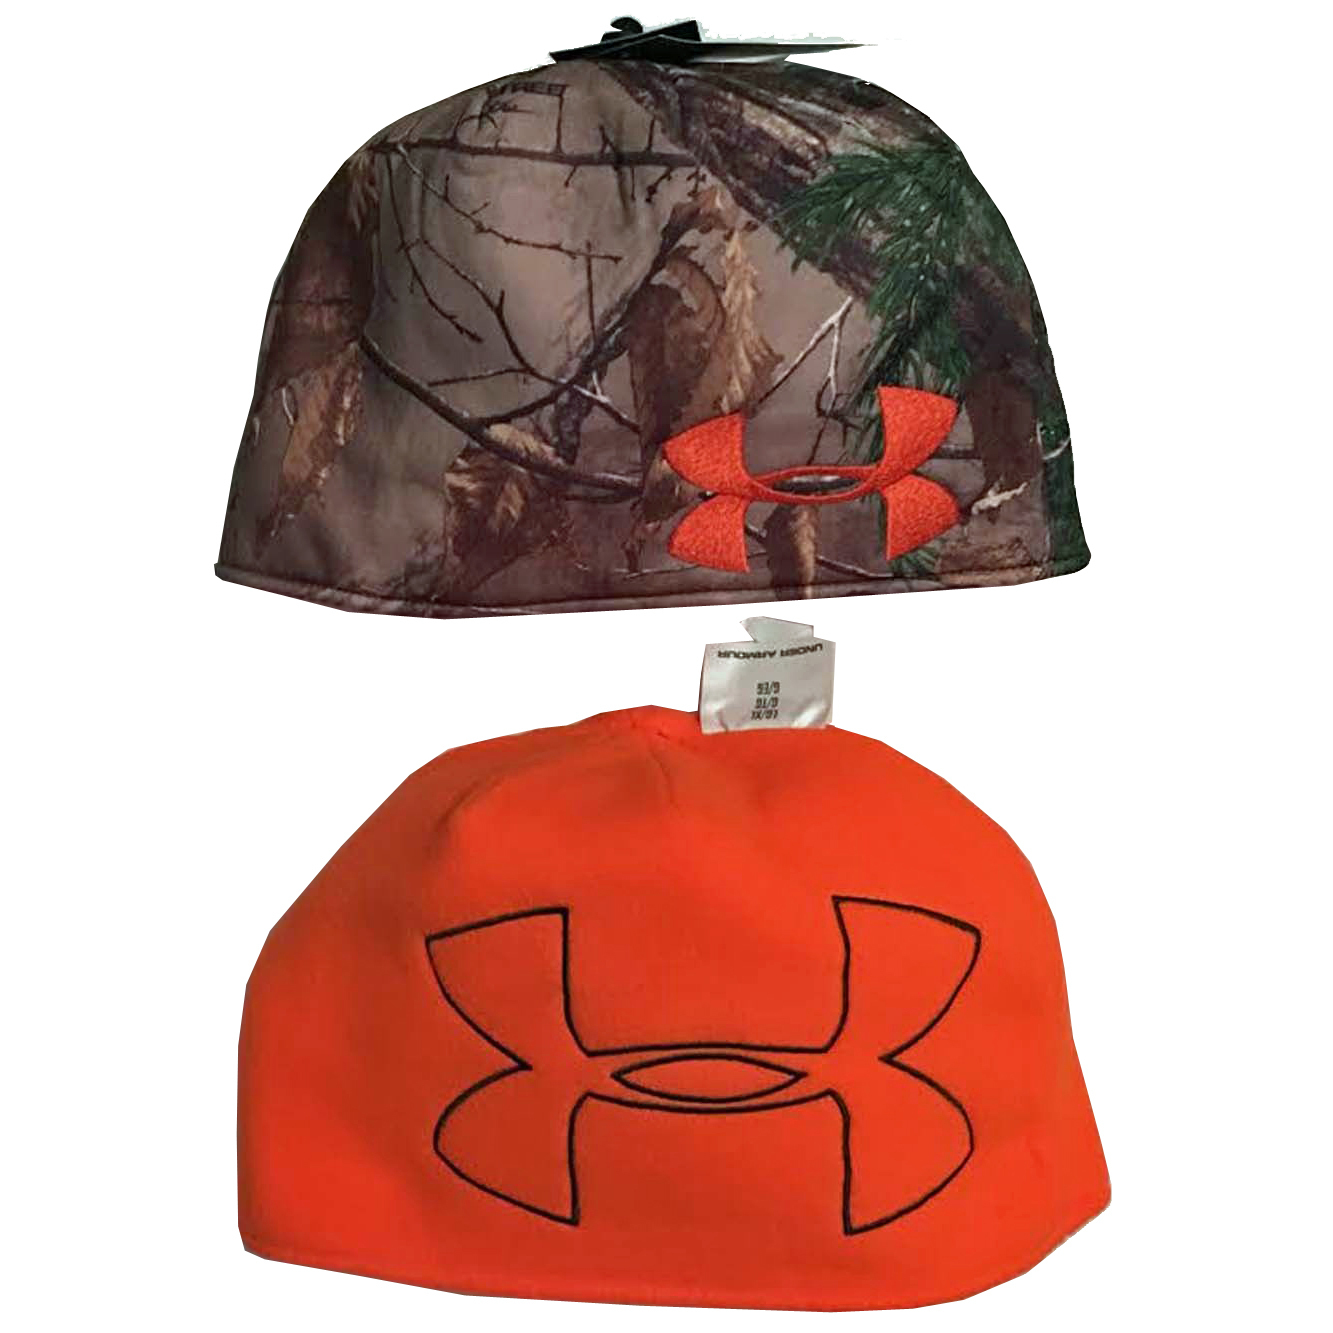 Under Armour Men's Realtree AP-Xtra Camo/Blaze Orange Reversible Beanie -Small/Medium 13725